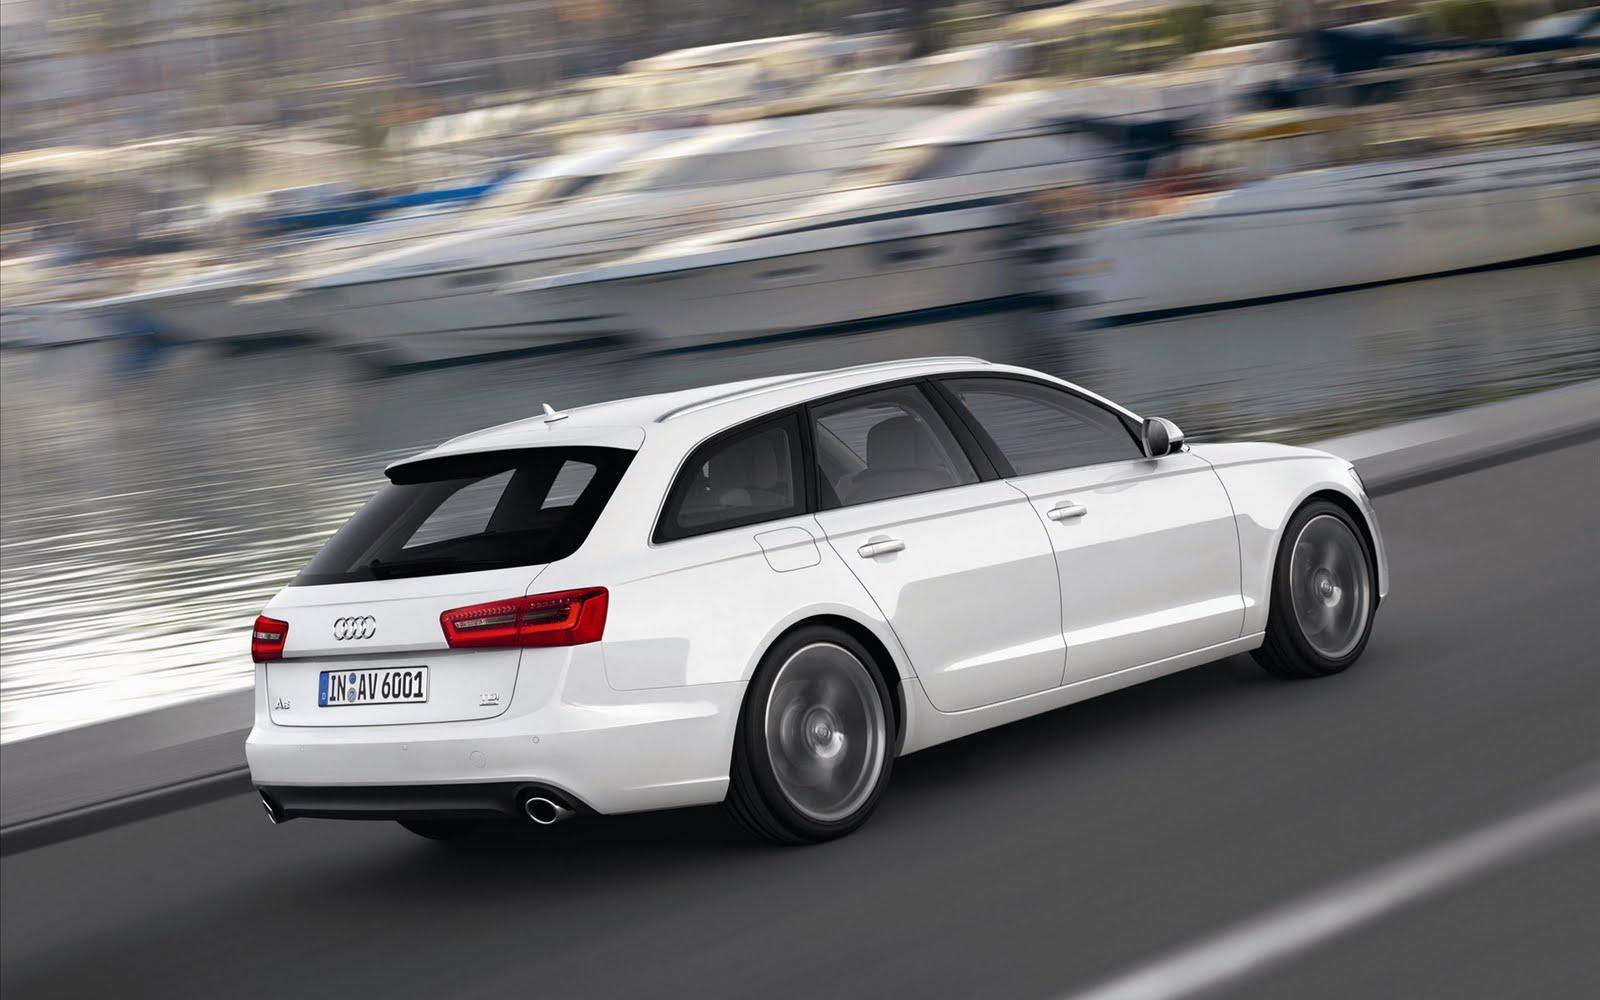 Audi A6 Avant 2012 Spec and ReviewCar Wallpaper Car Pictures